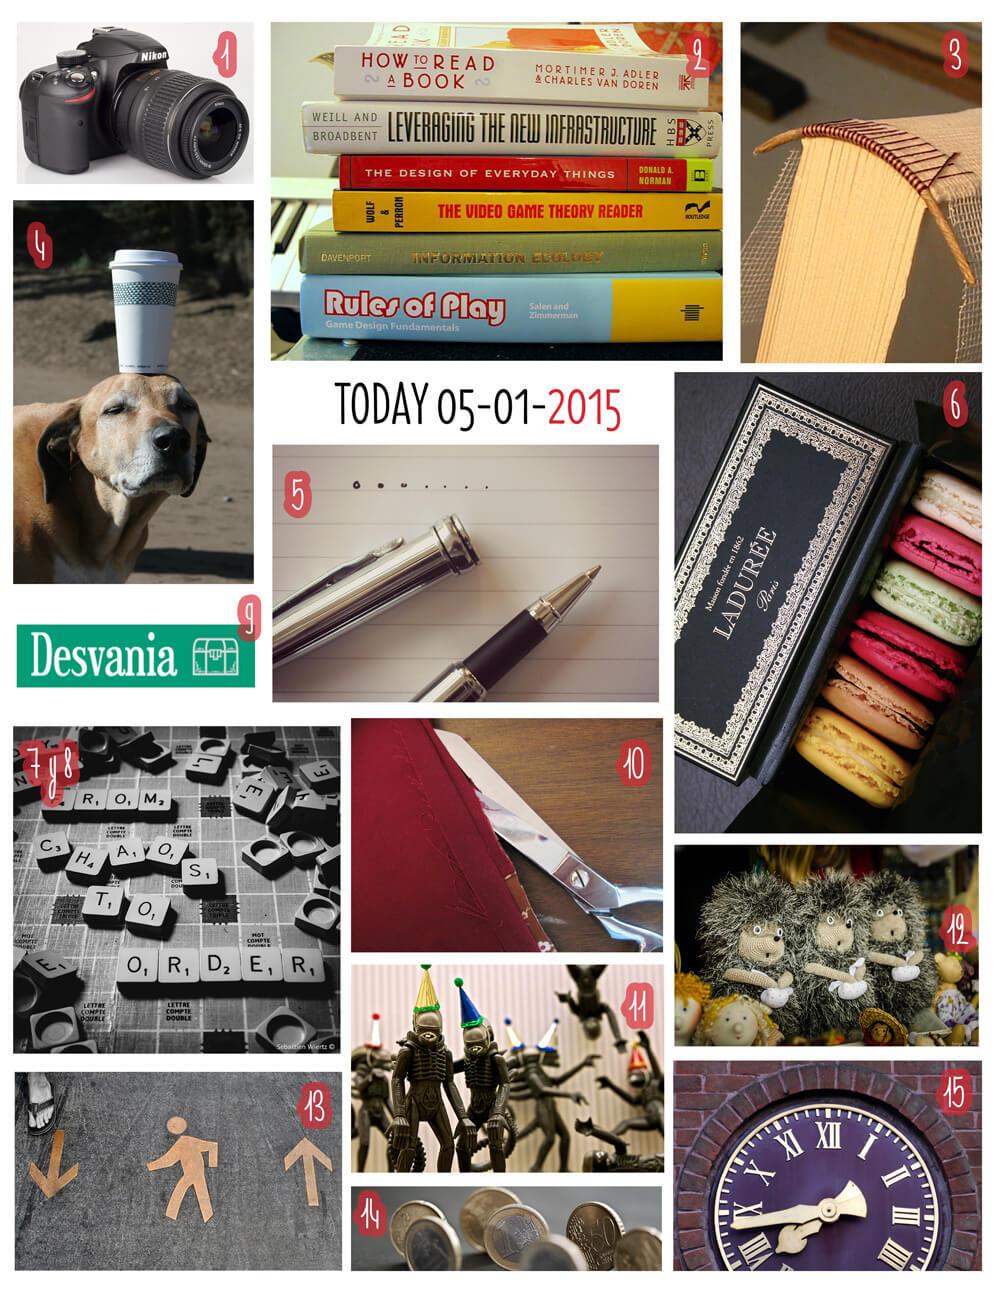 Today Disperso para 2015 #TODAY5115